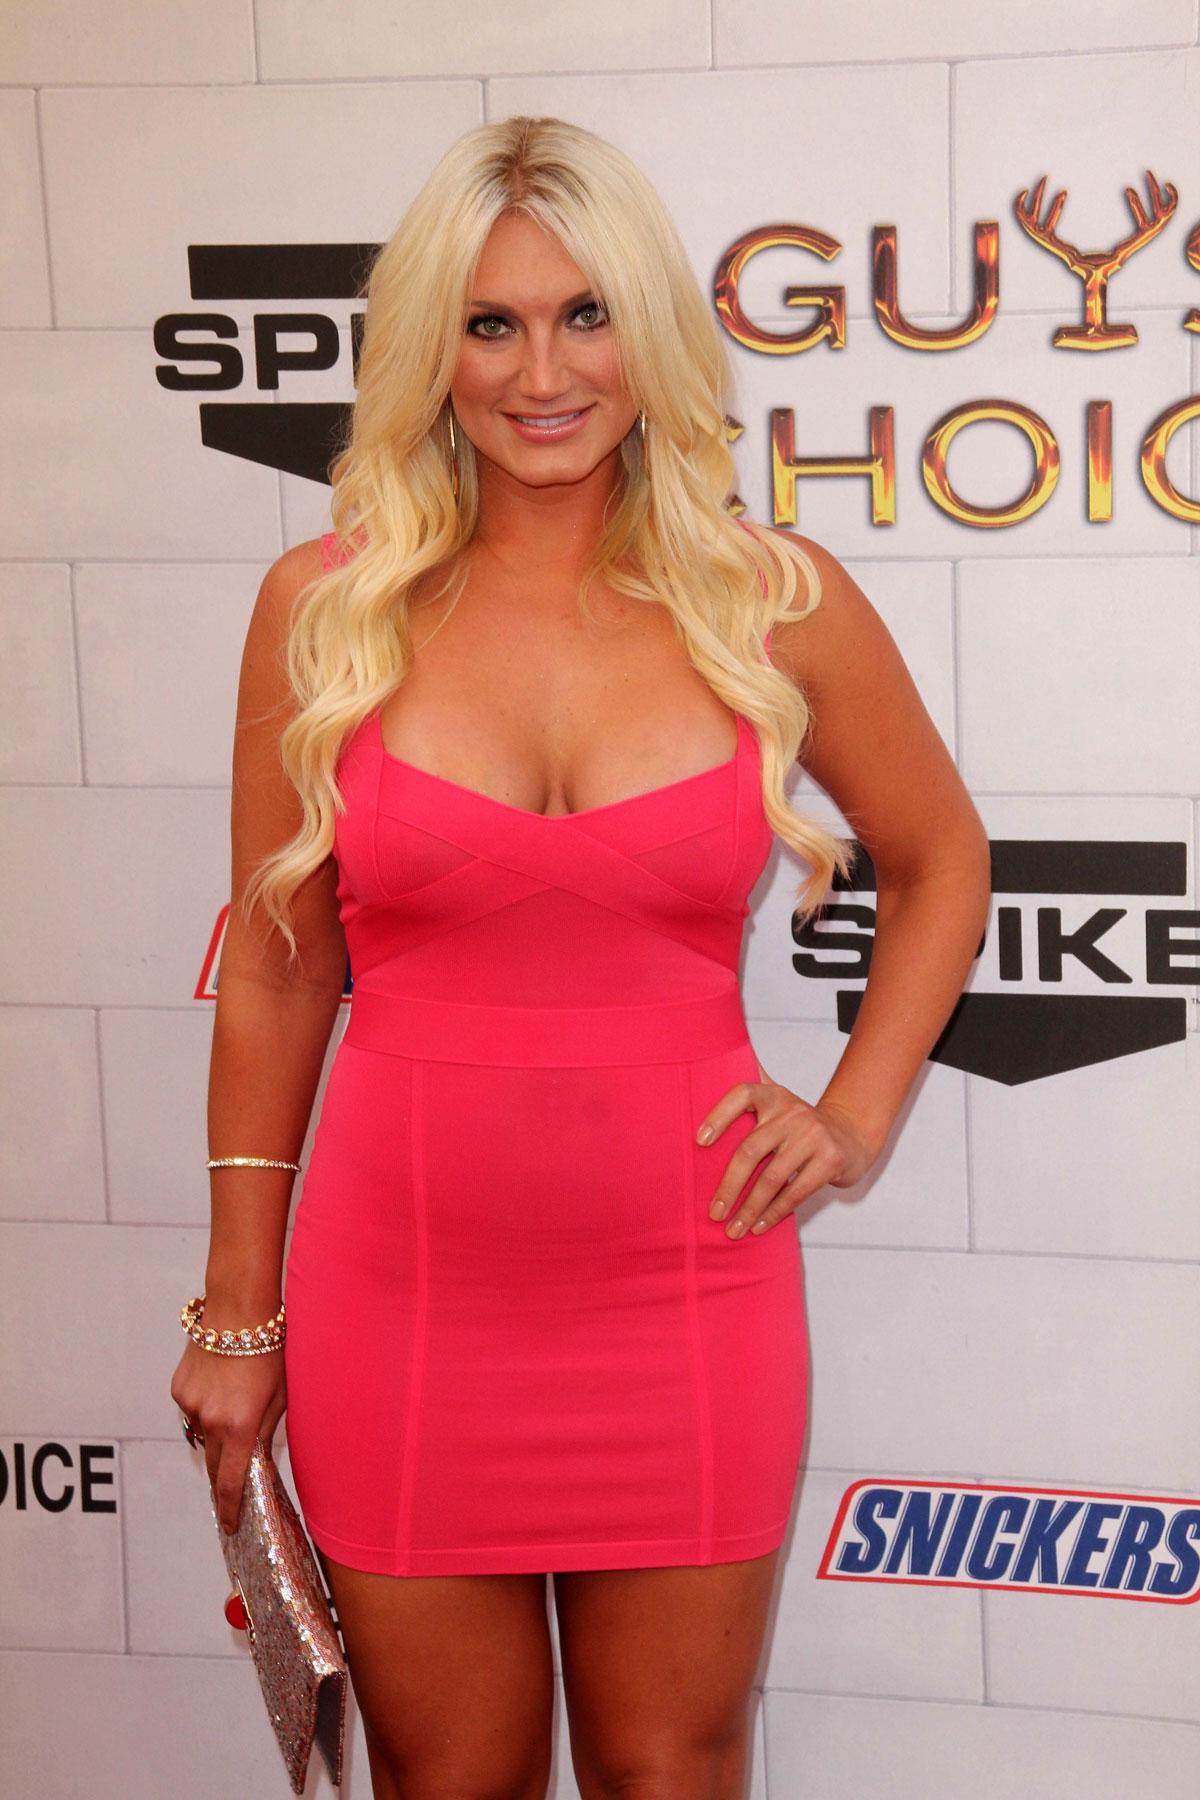 Brooke Hogan Boyfriend 2013